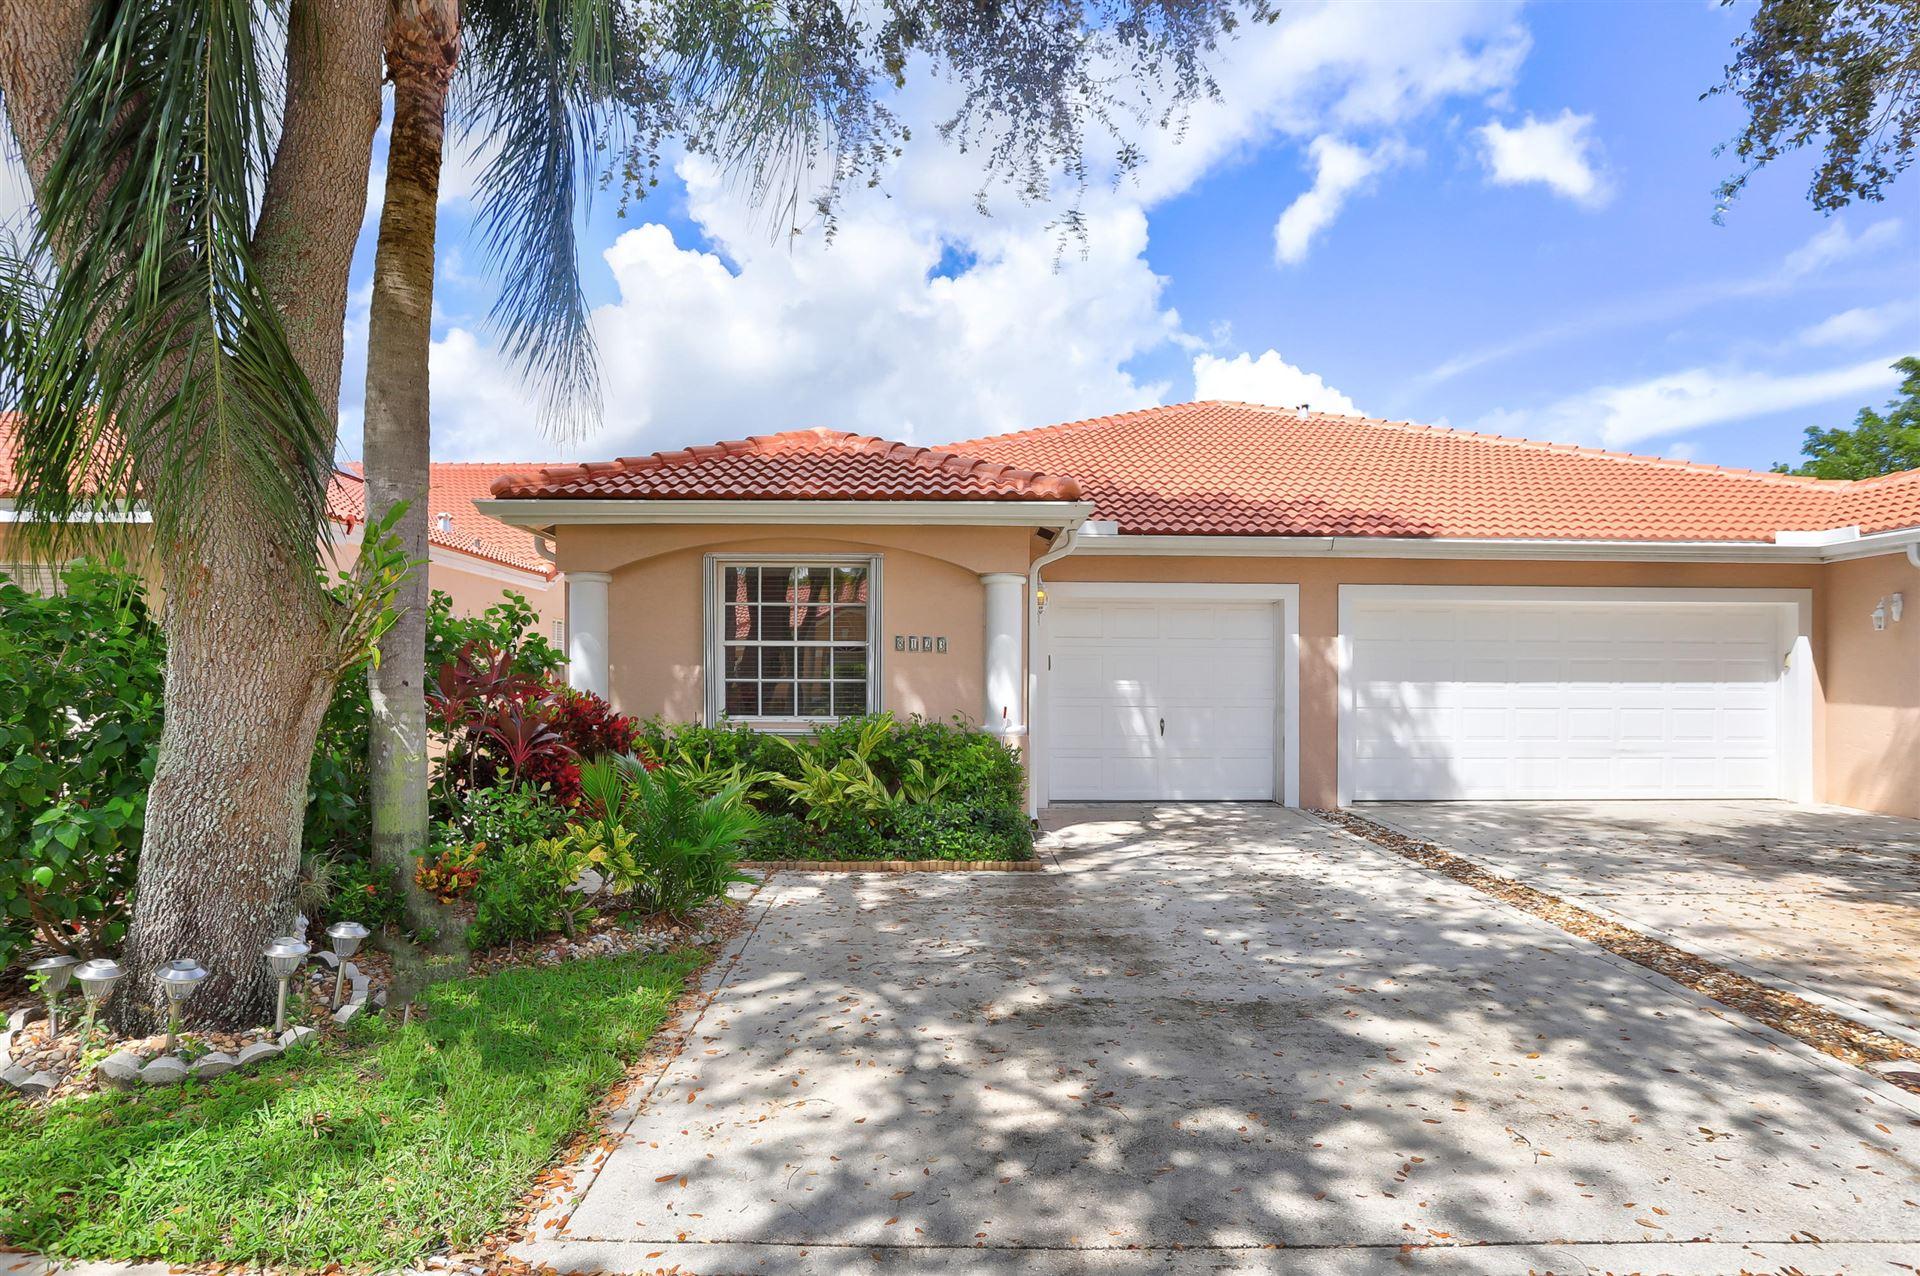 8123 Via Di Veneto, Boca Raton, FL 33496 - #: RX-10660204